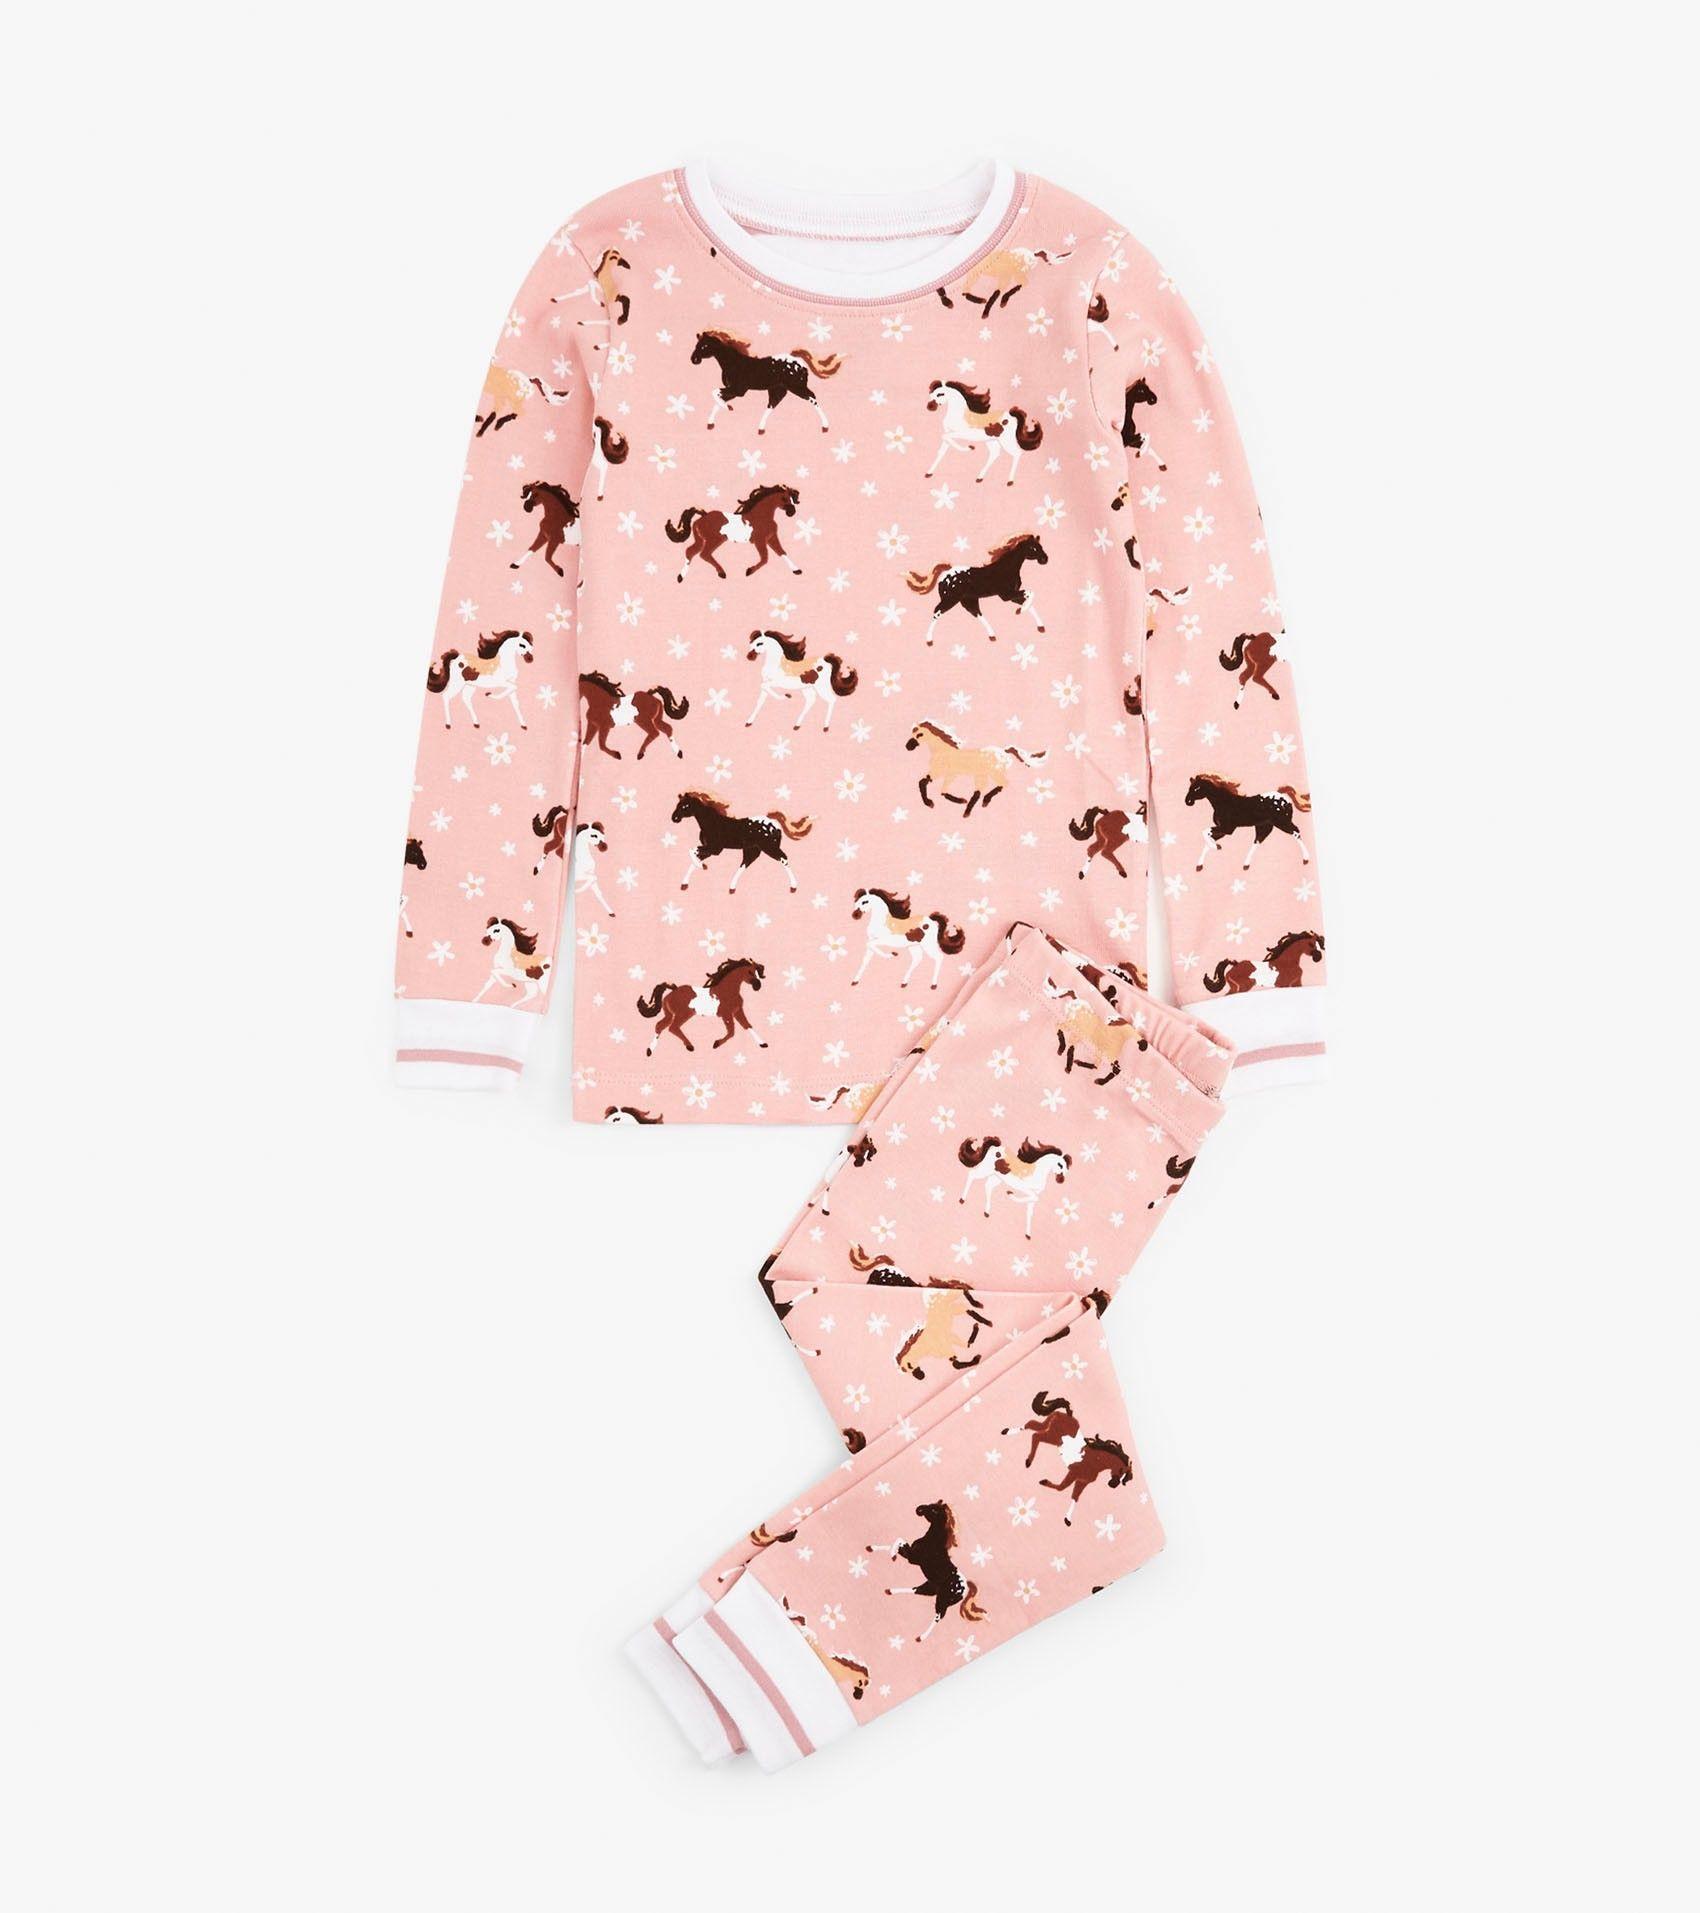 Frolicking Horses Organic Cotton Pajama Set New Arrivals